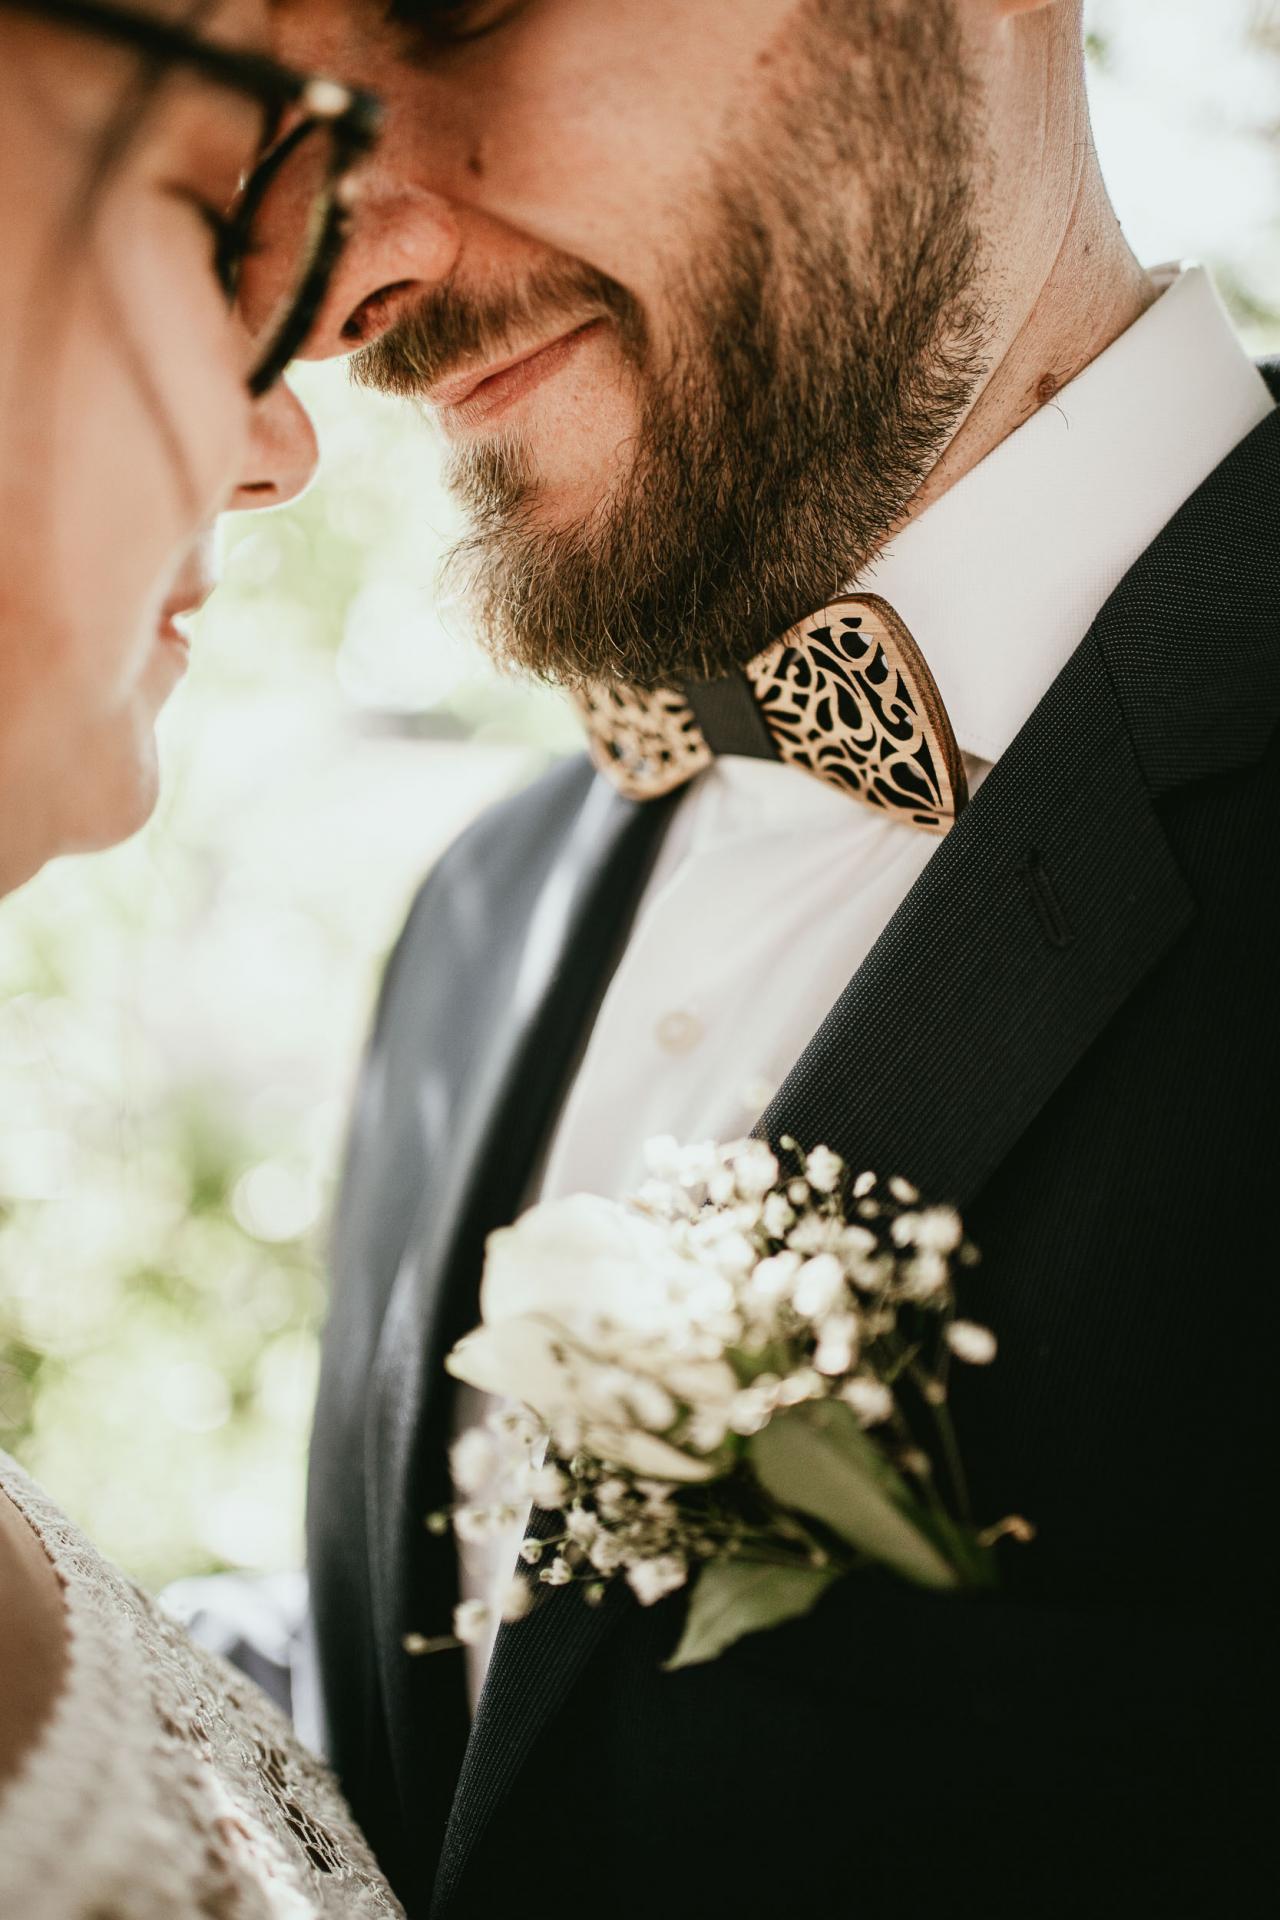 Photographe de mariage moody boho chic boheme dax landes aquitaine fineart 32